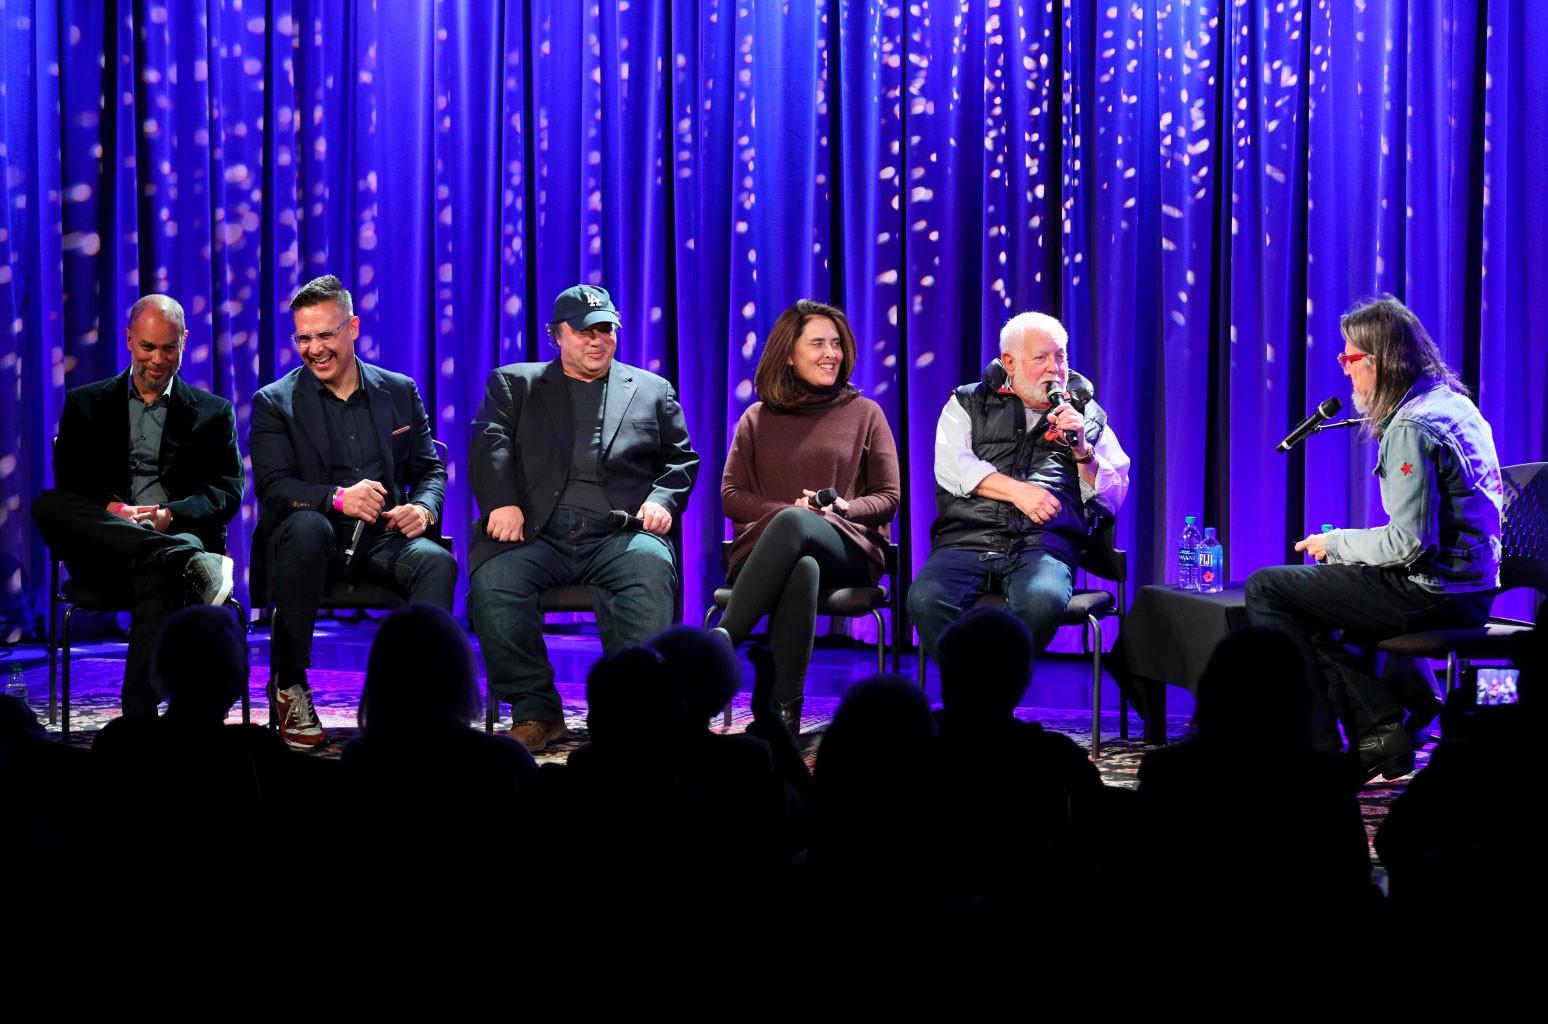 Jesse Collins, Raj Kapoor, David Wild, Chantel Sausedo and Ken Ehrlich speak with Scott Goldman